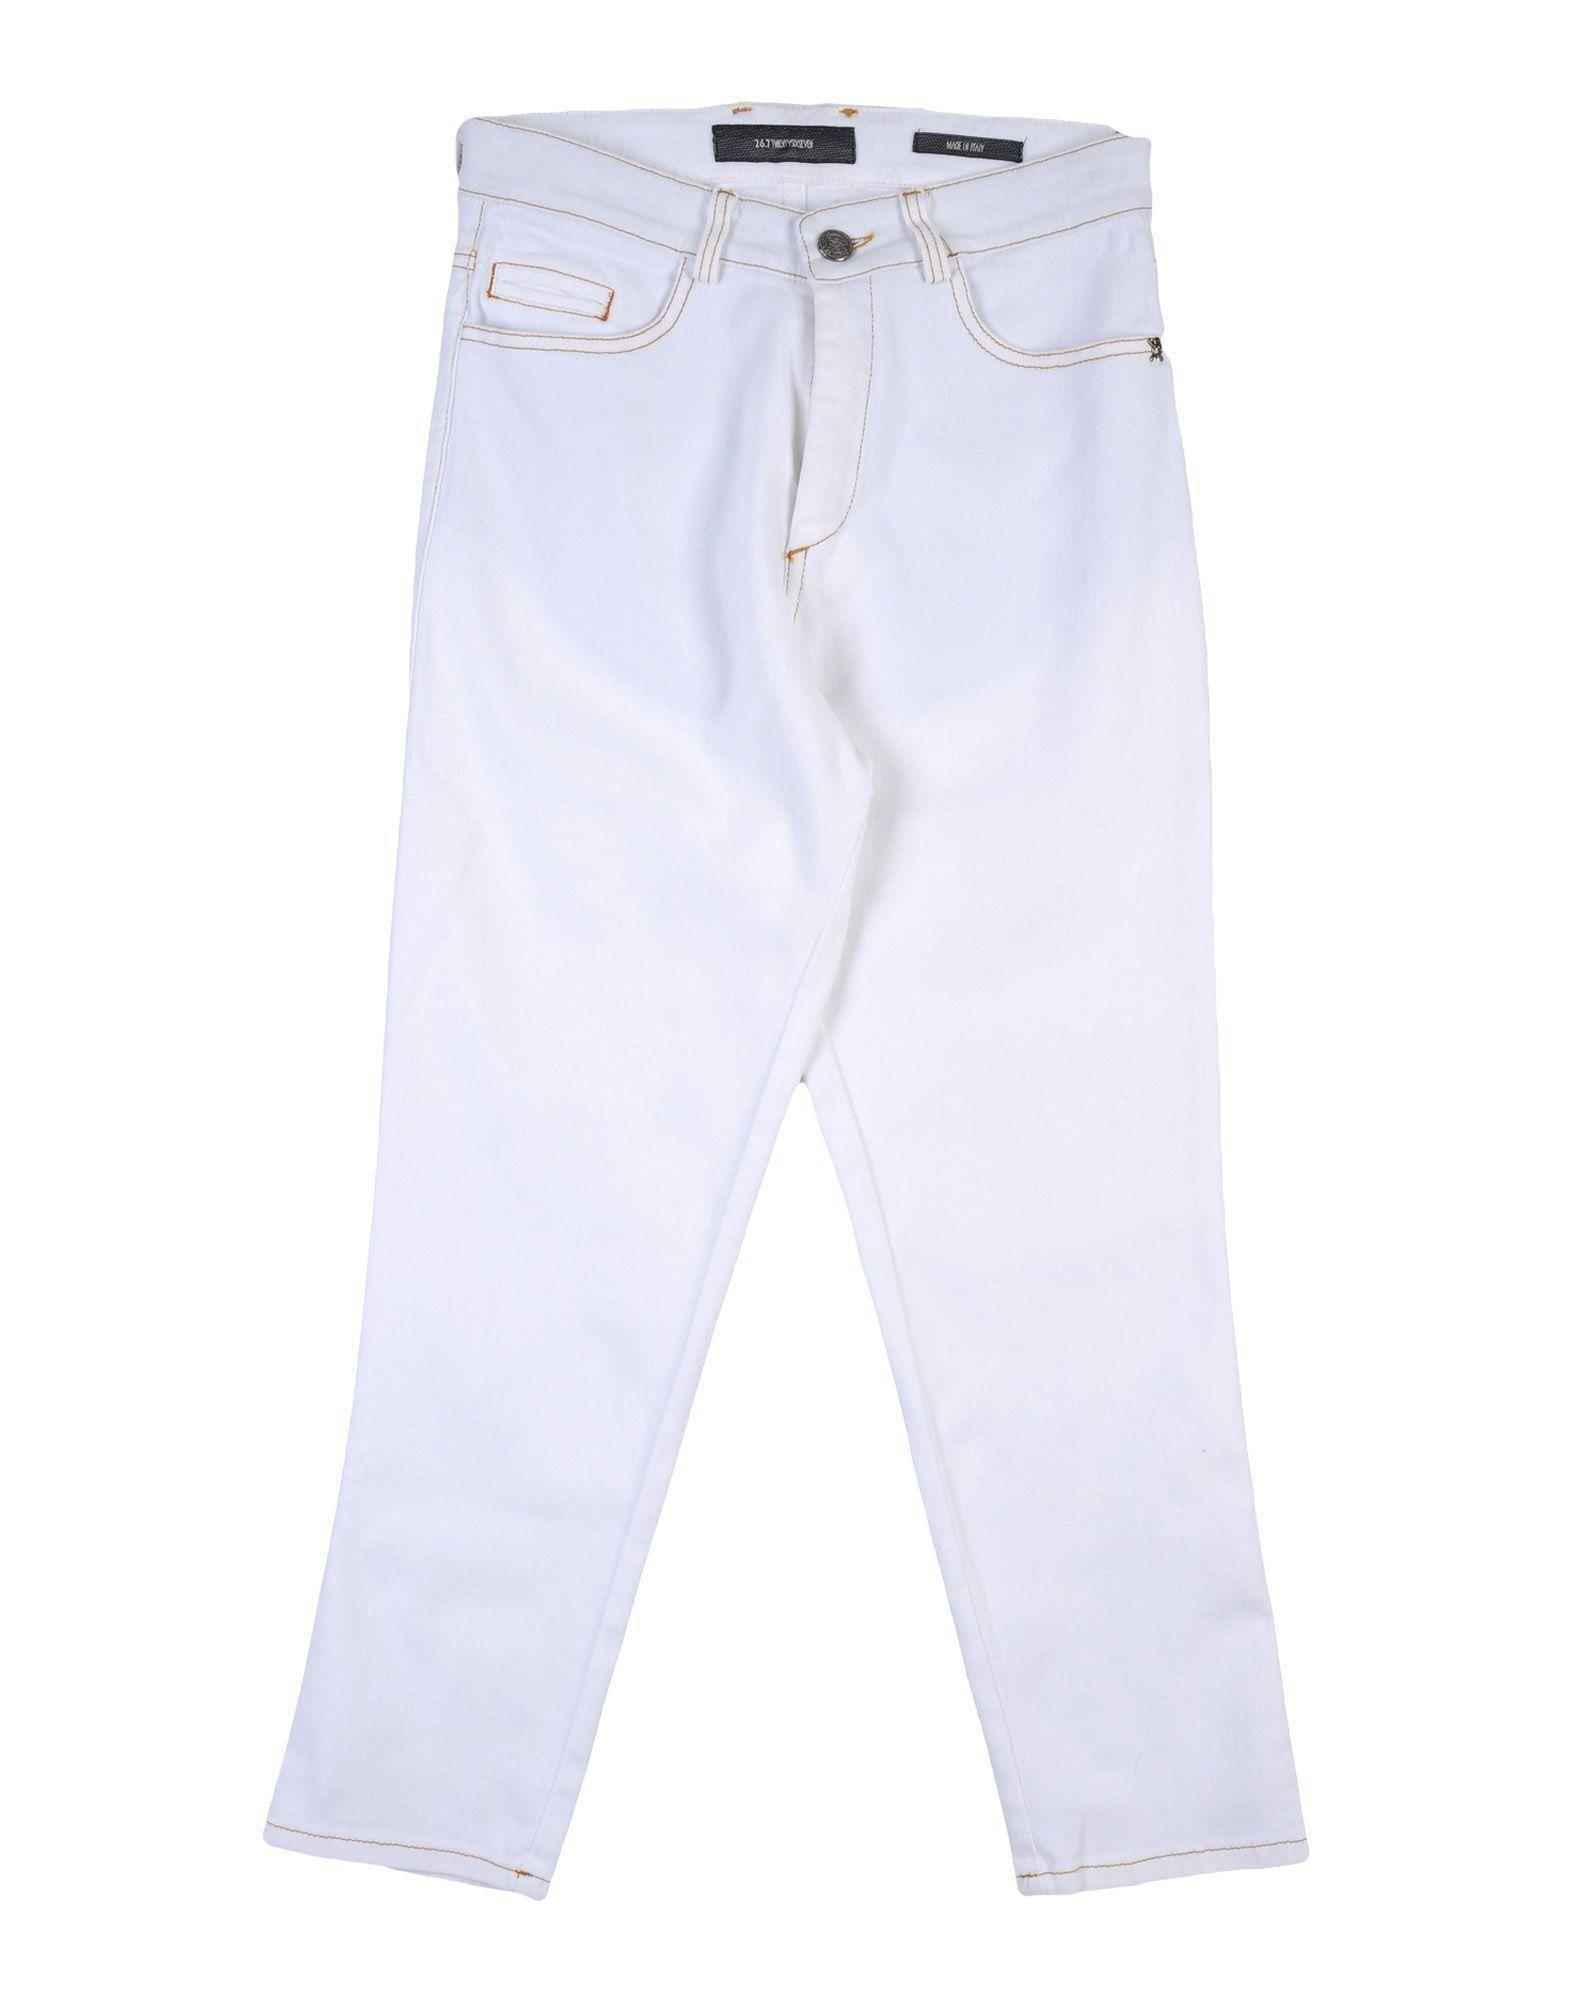 DENIM 26.7 Twentysixseven White Boy Cotton